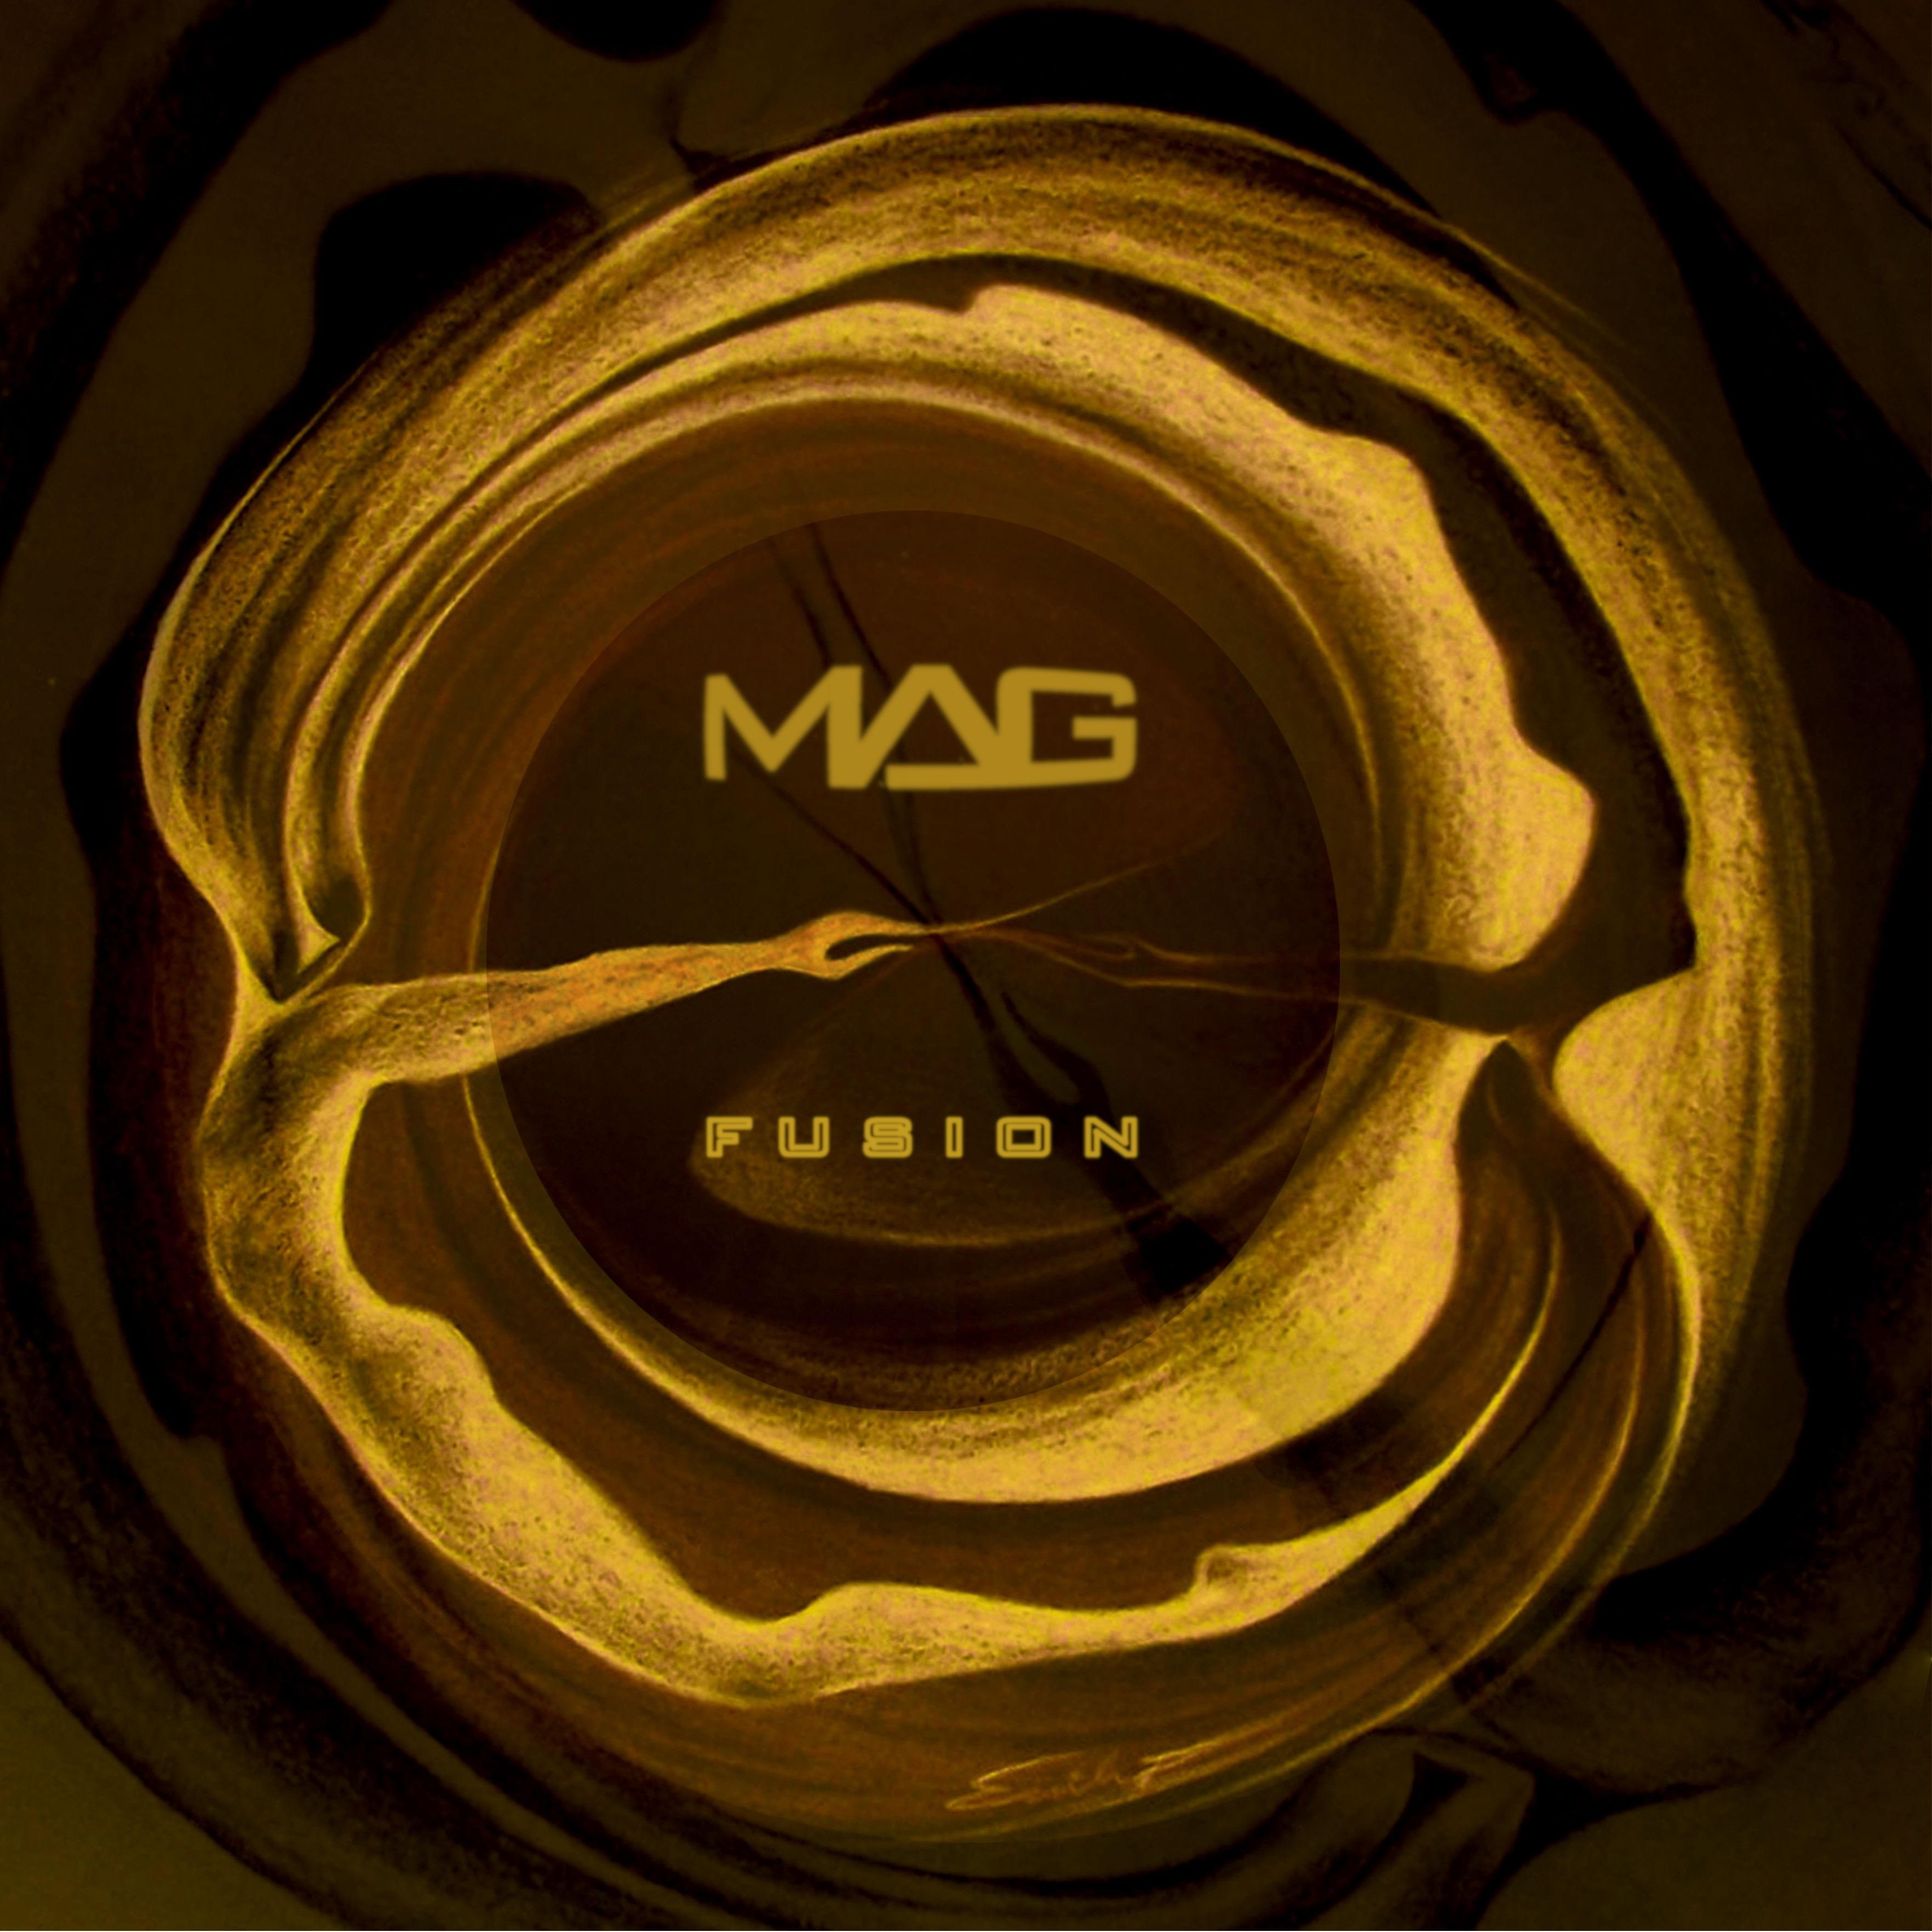 mag_fusion_borito_v3_1.jpg